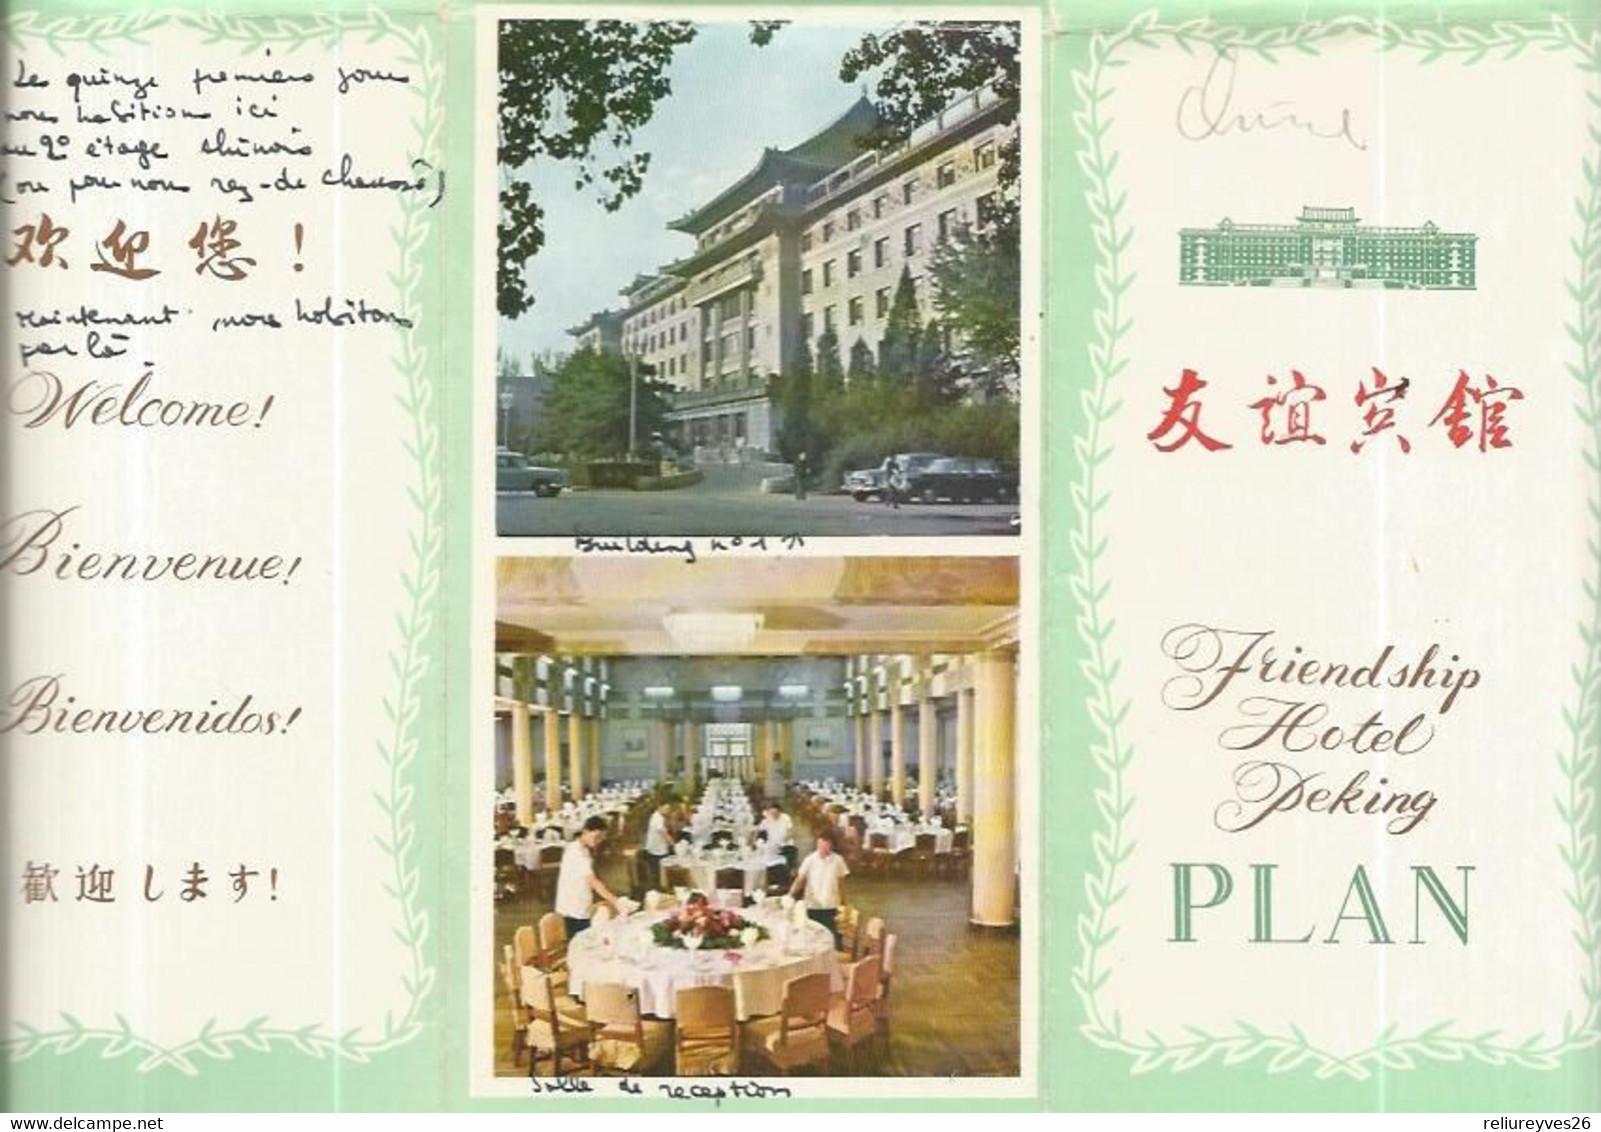 Chine - Friend Ship Hotel Peking Plan - World